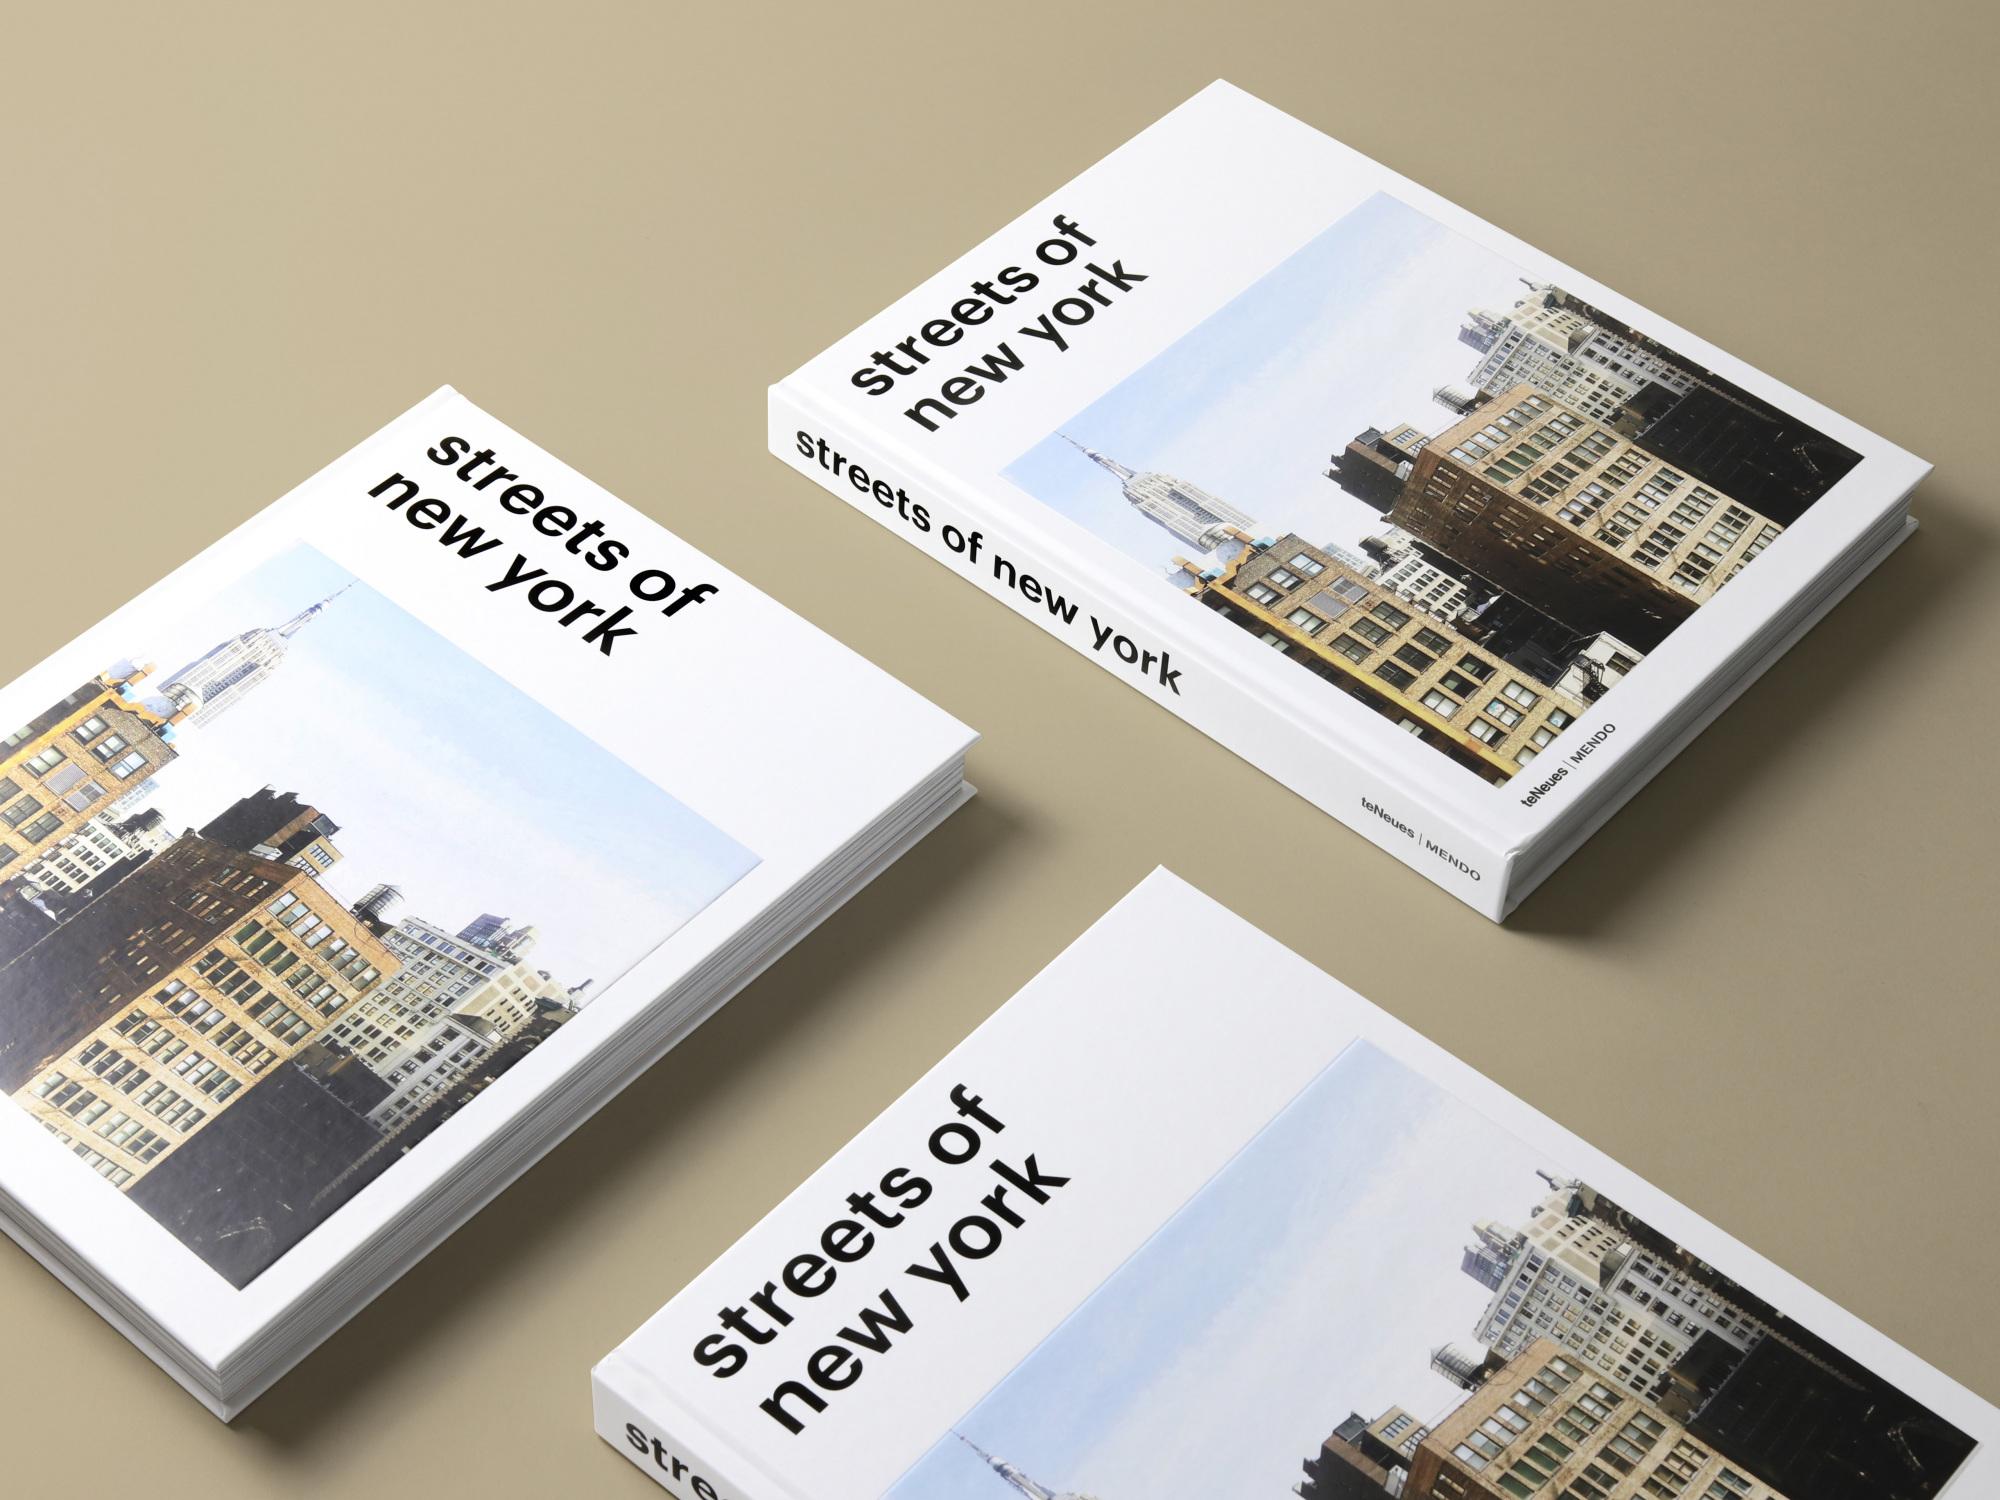 mendo-book-streets-of-new-york-01-2-2000x1500-c-default.jpg